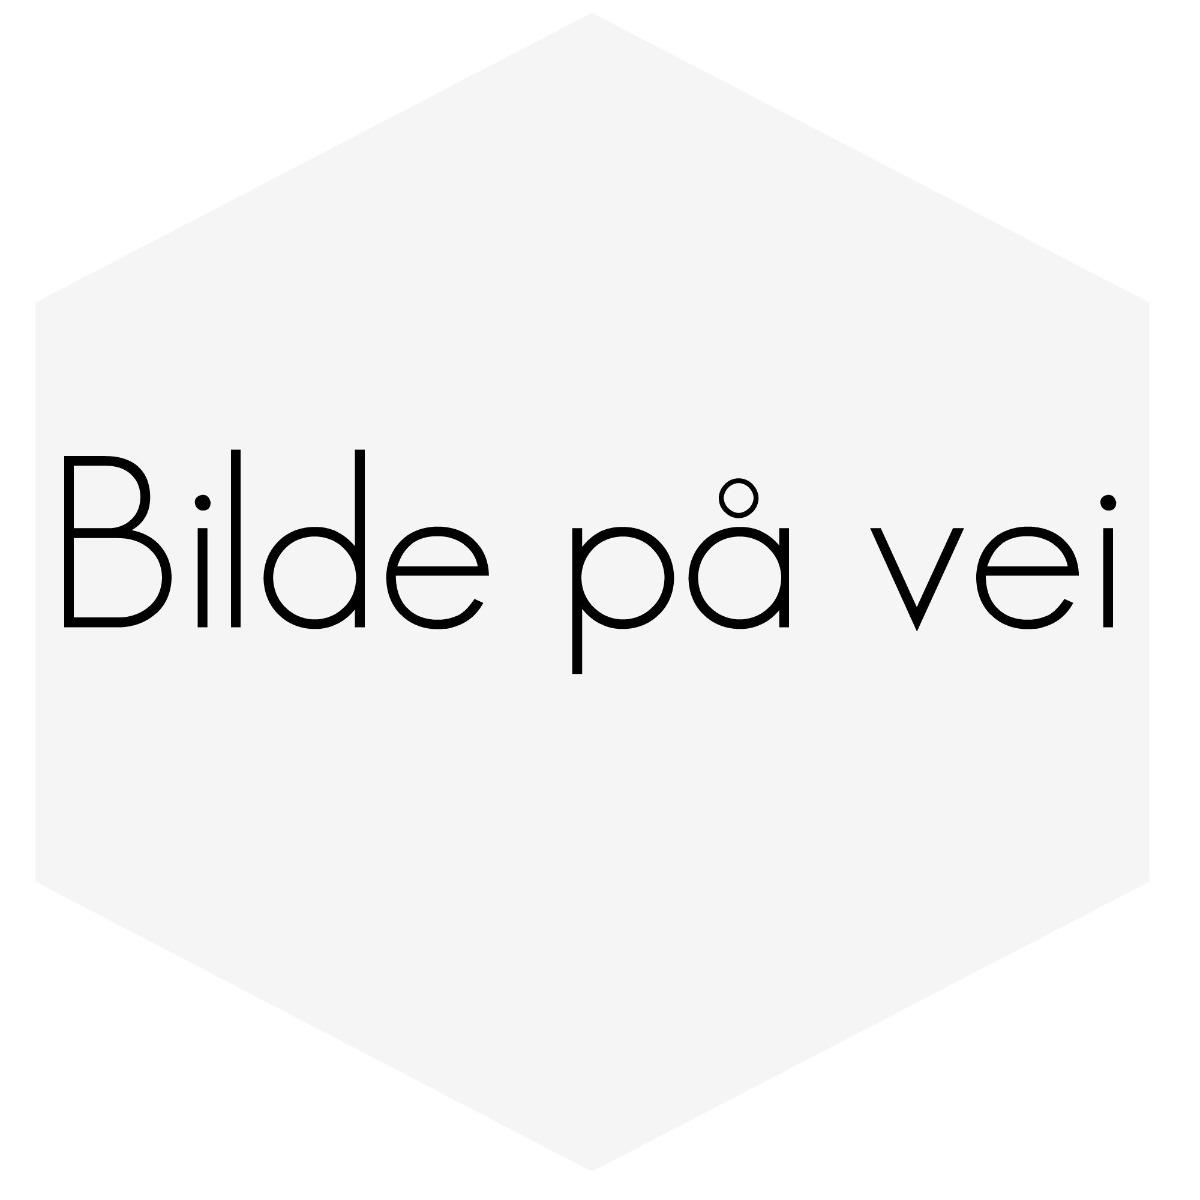 CLUTCH SLAVESYLINDER/UTLØSERLAGER Volvo se info: